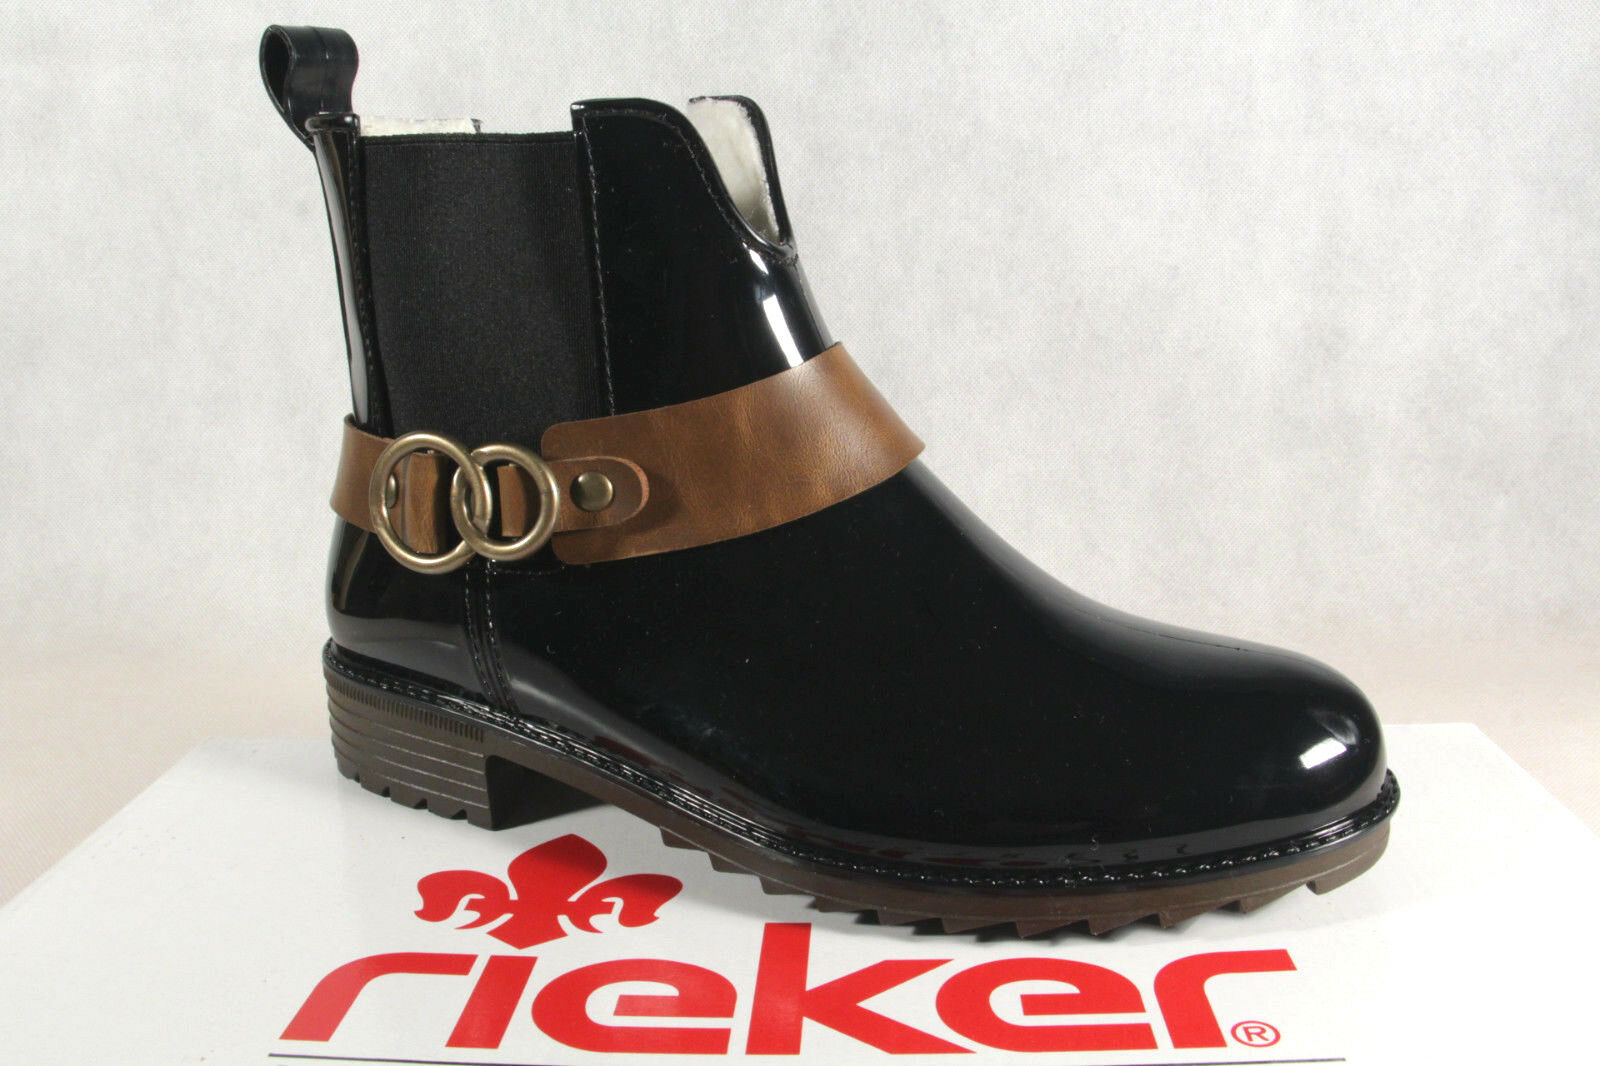 Rieker Stiefelette Stiefelette P8288 00 | sportiv |